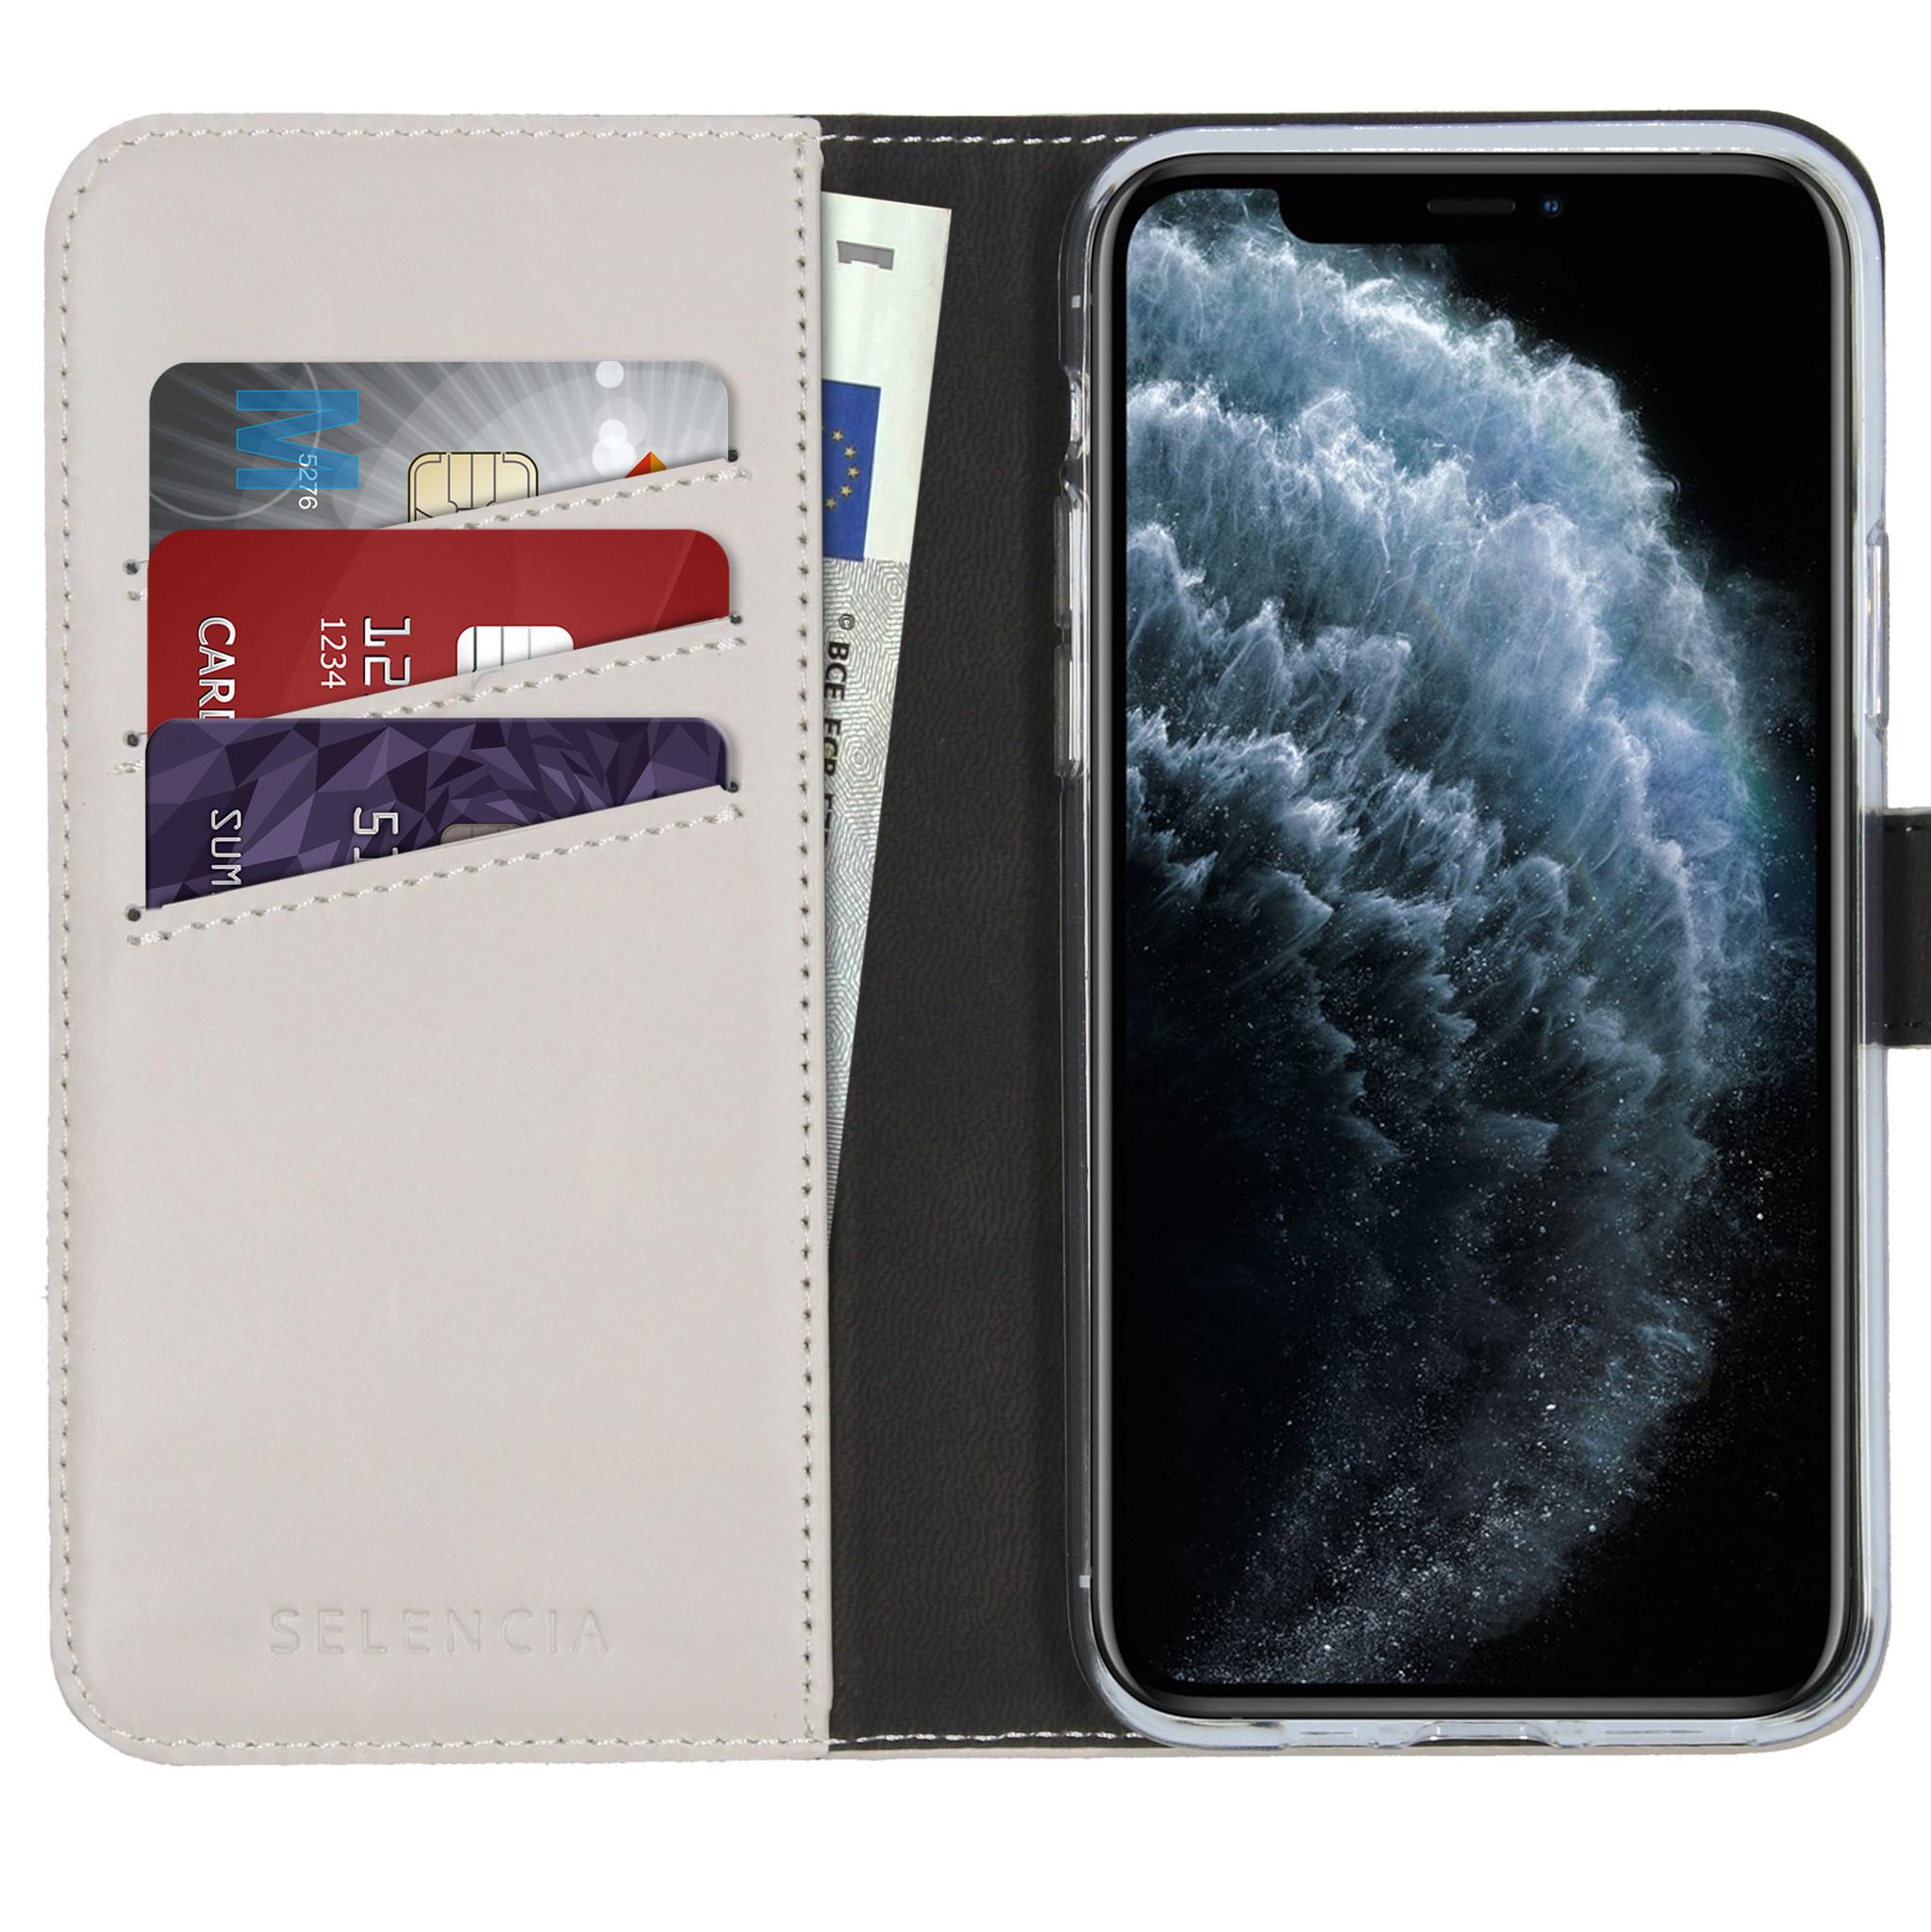 Selencia Echt Lederen Booktype iPhone 11 Pro - Lichtgrijs